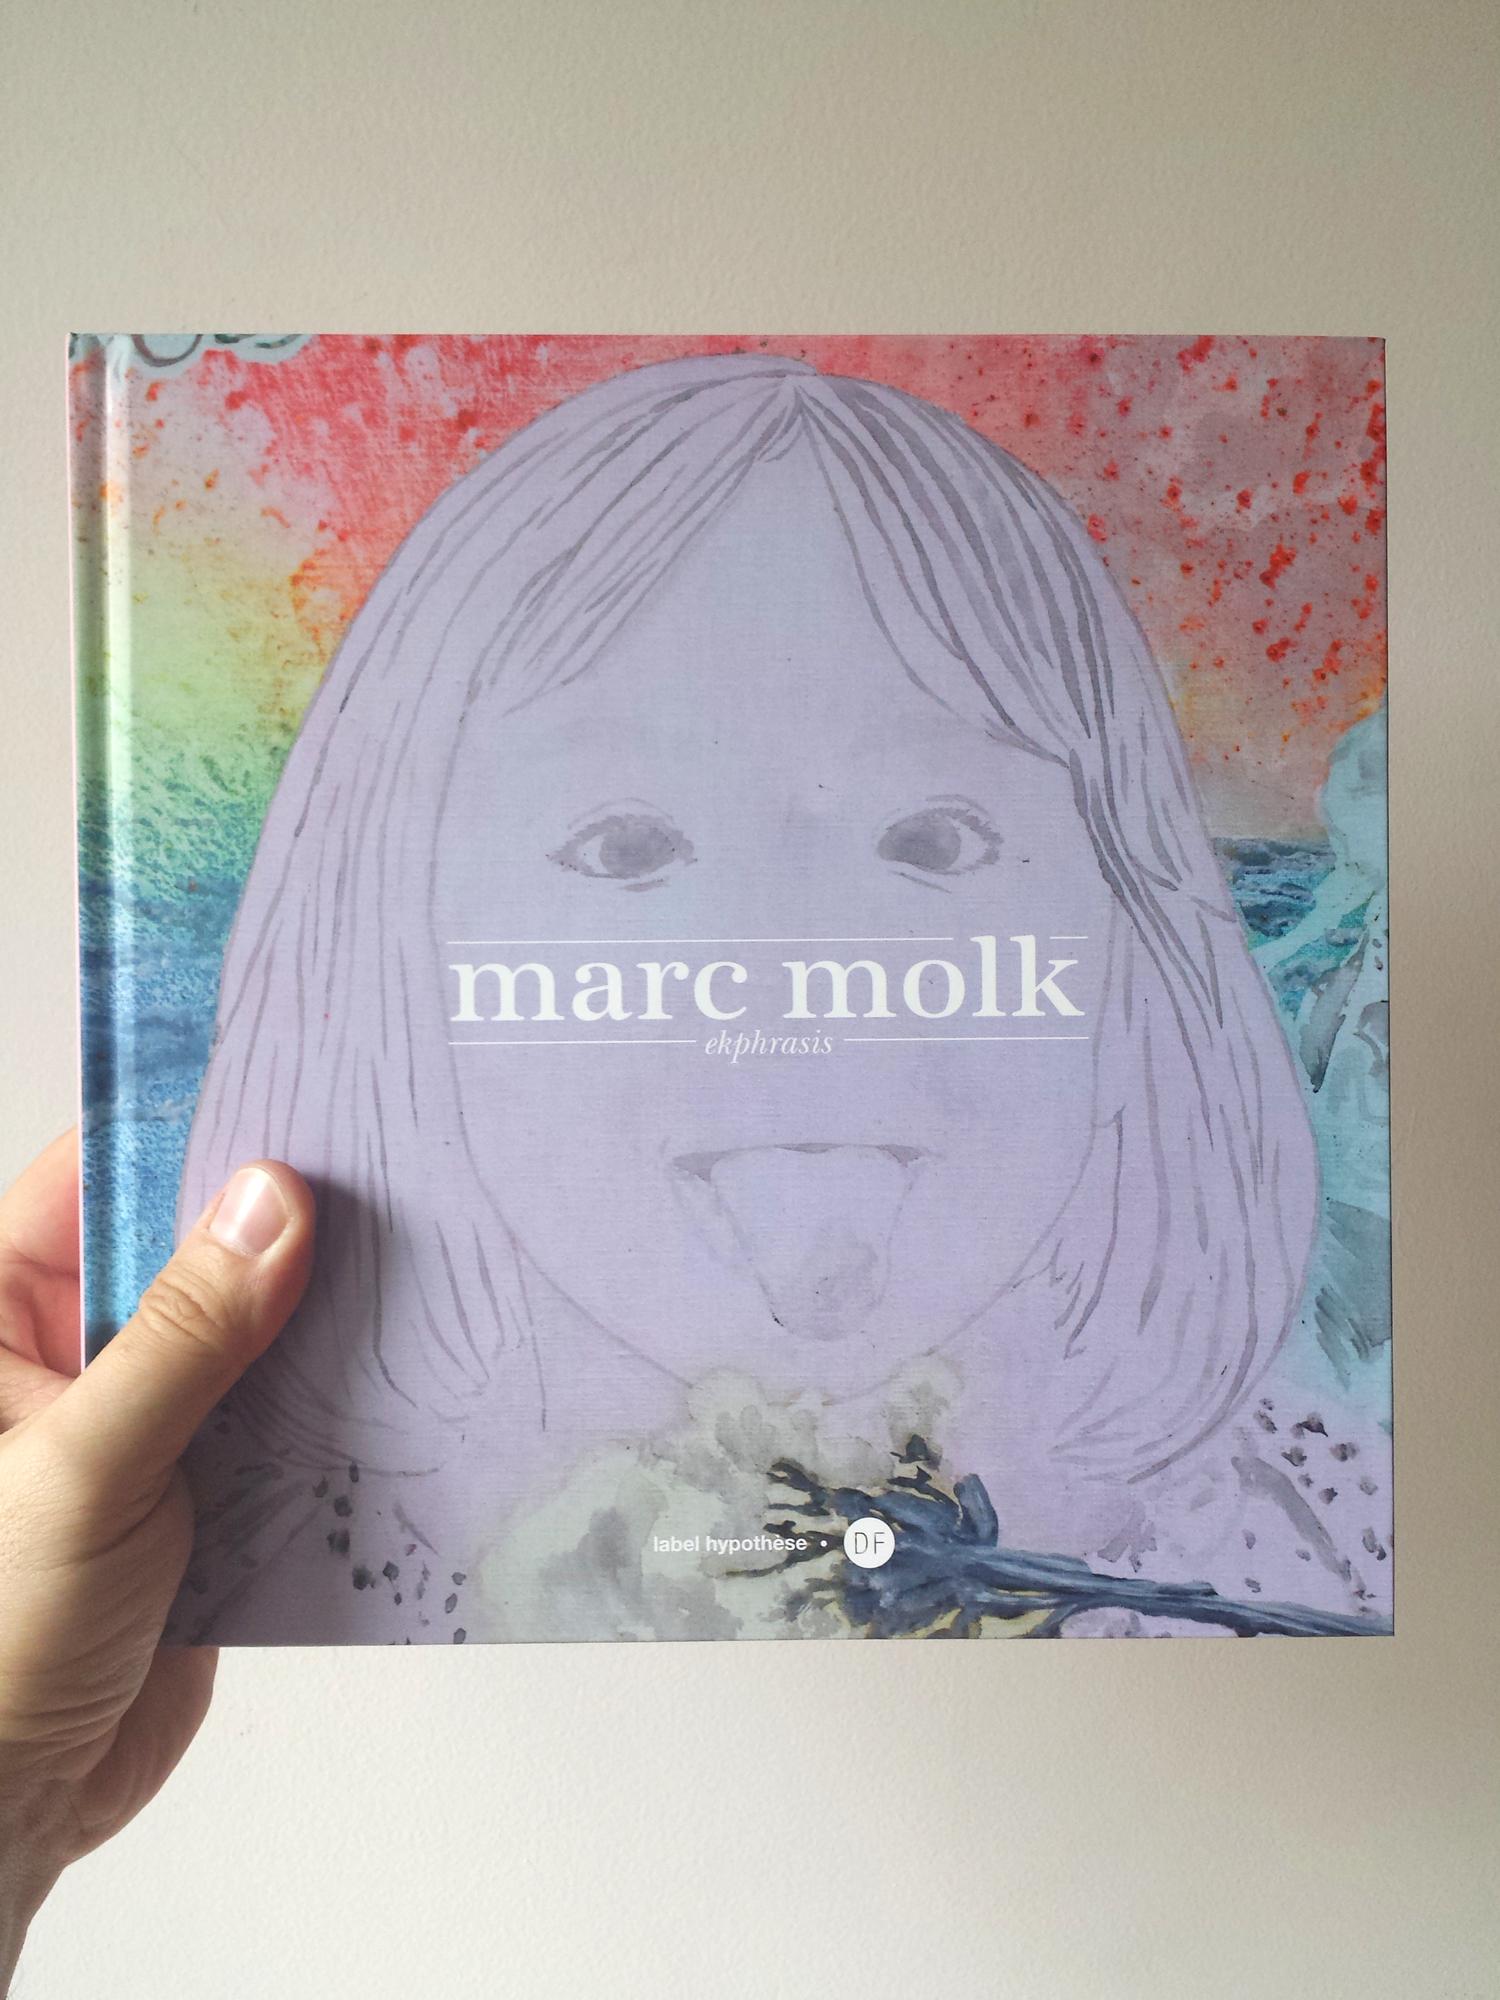 « Marc Molk : Ekphrasis », éditions D-Fiction & label hypothèse, 2012